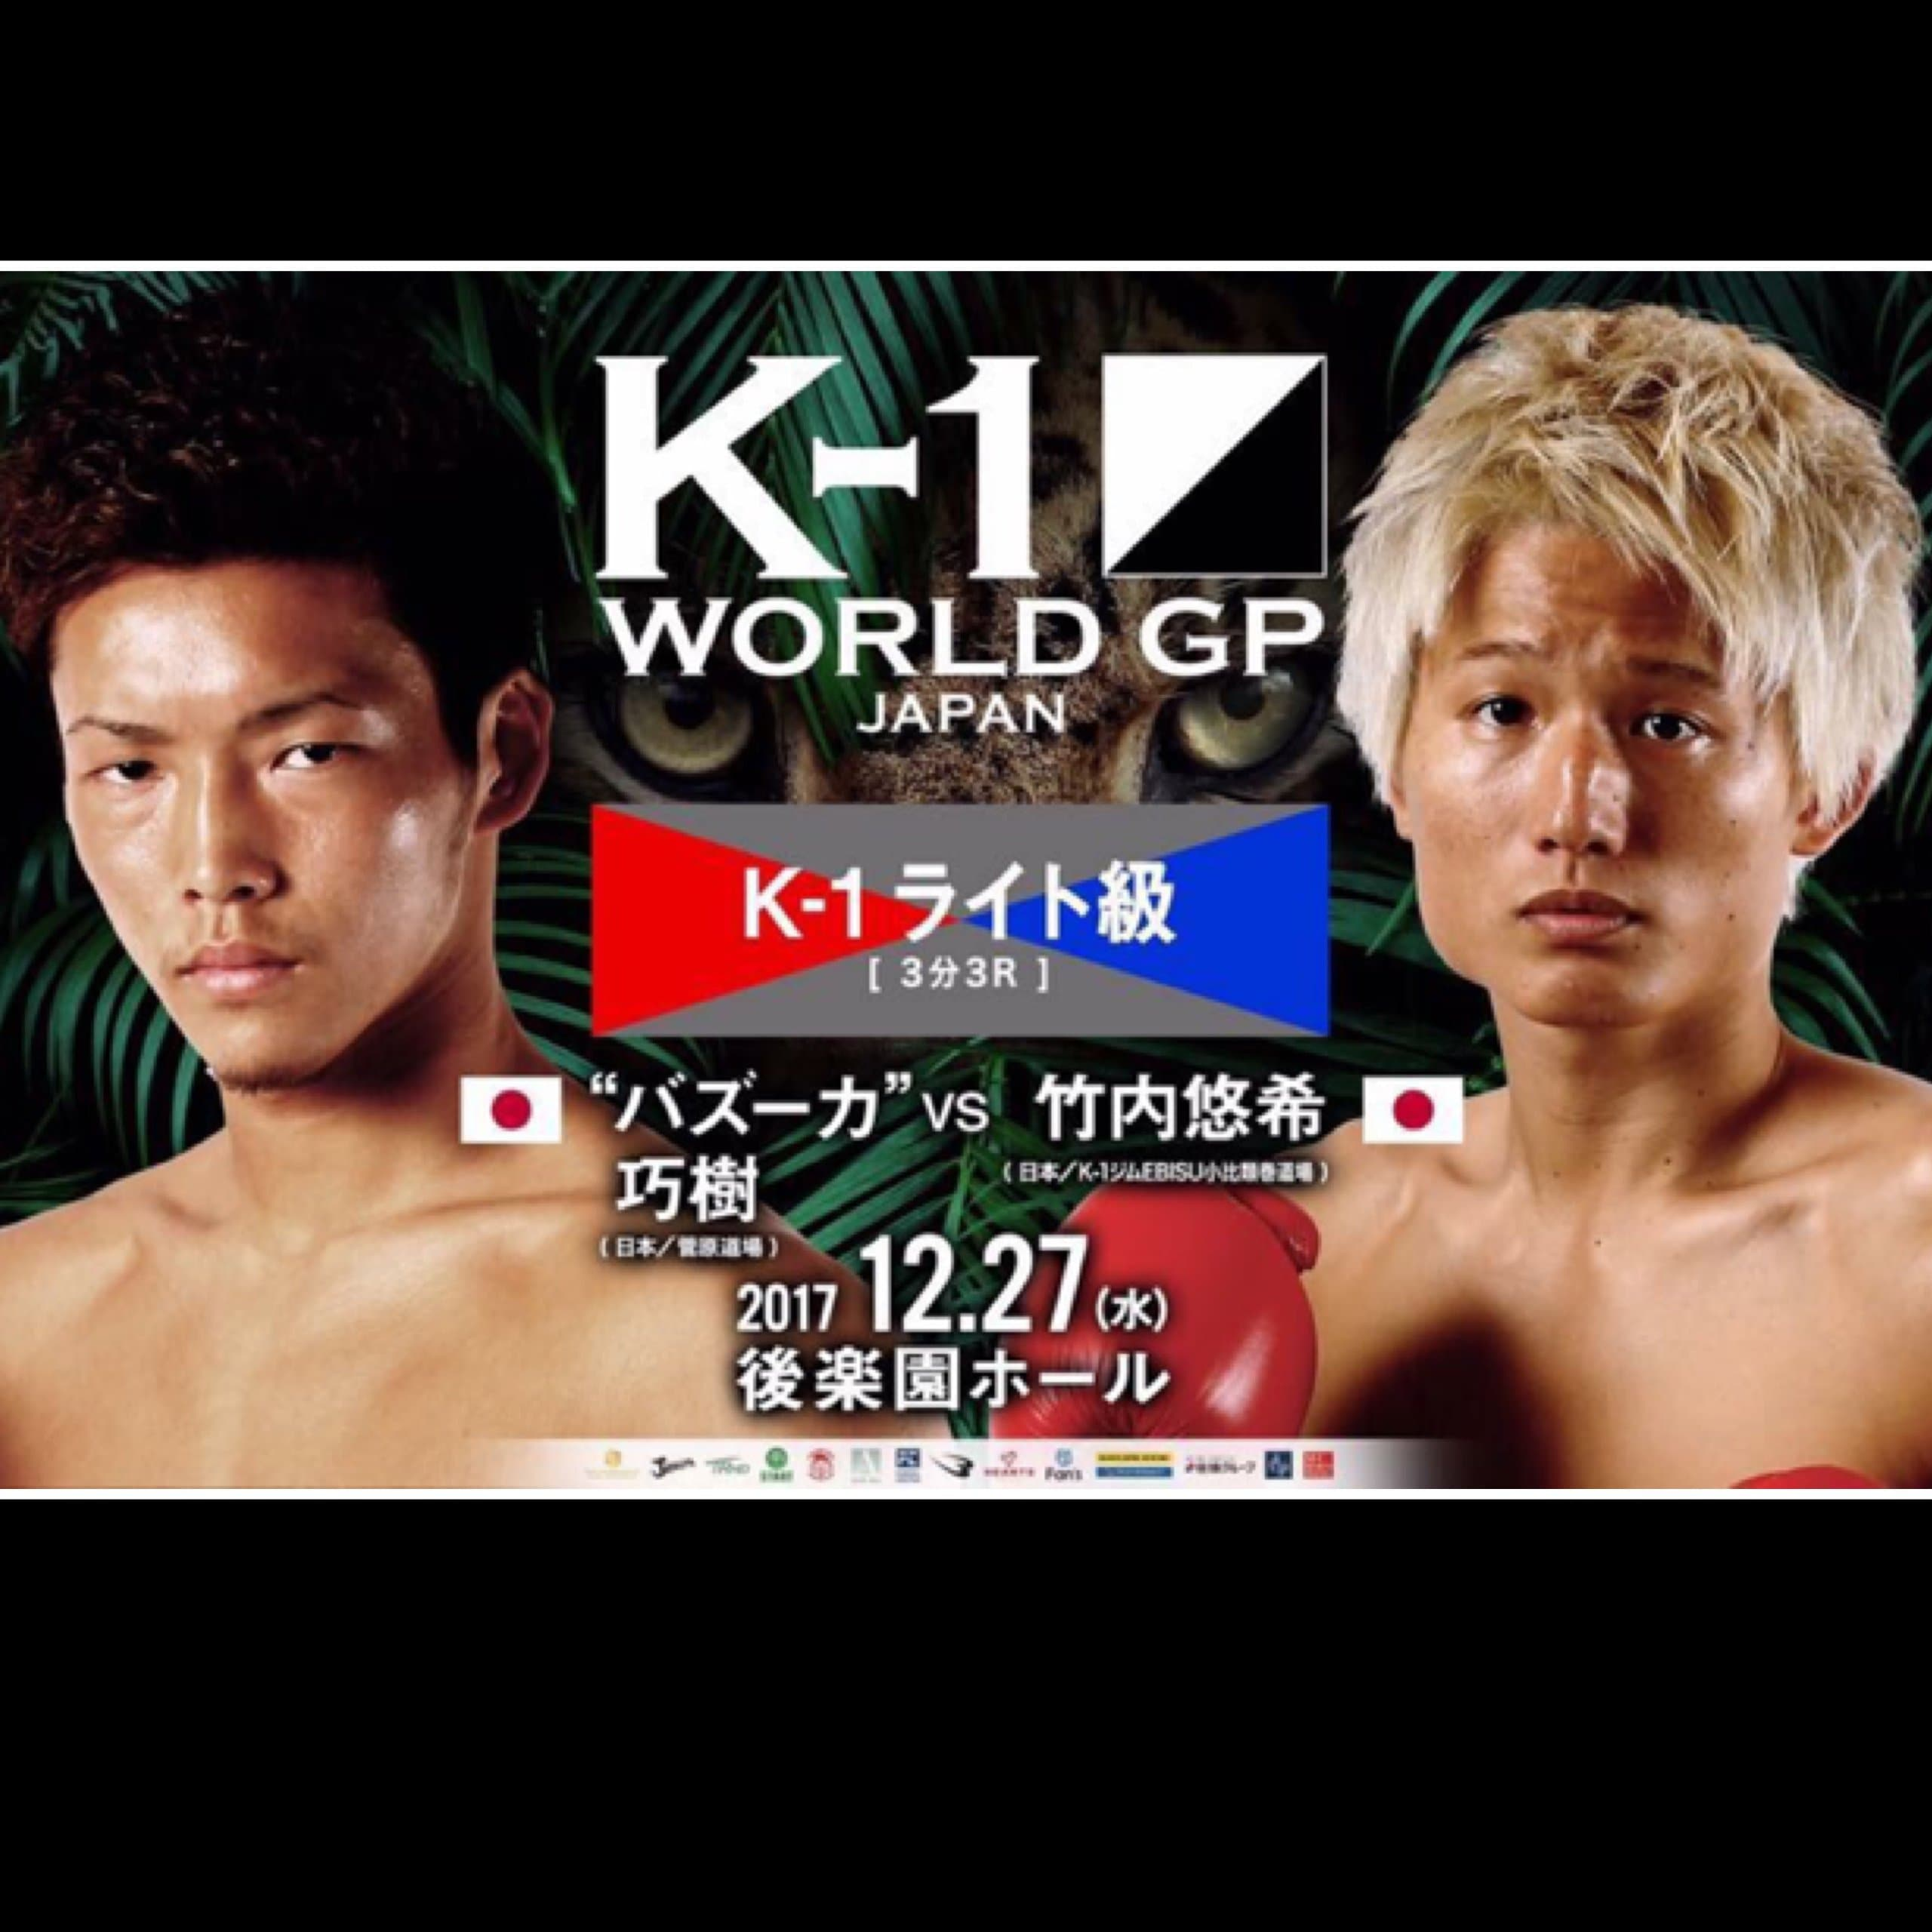 【A席】2017.12.27(水)『K−1 WORLD GP』後楽園(店頭払い・銀行振込のみ)のイメージその1